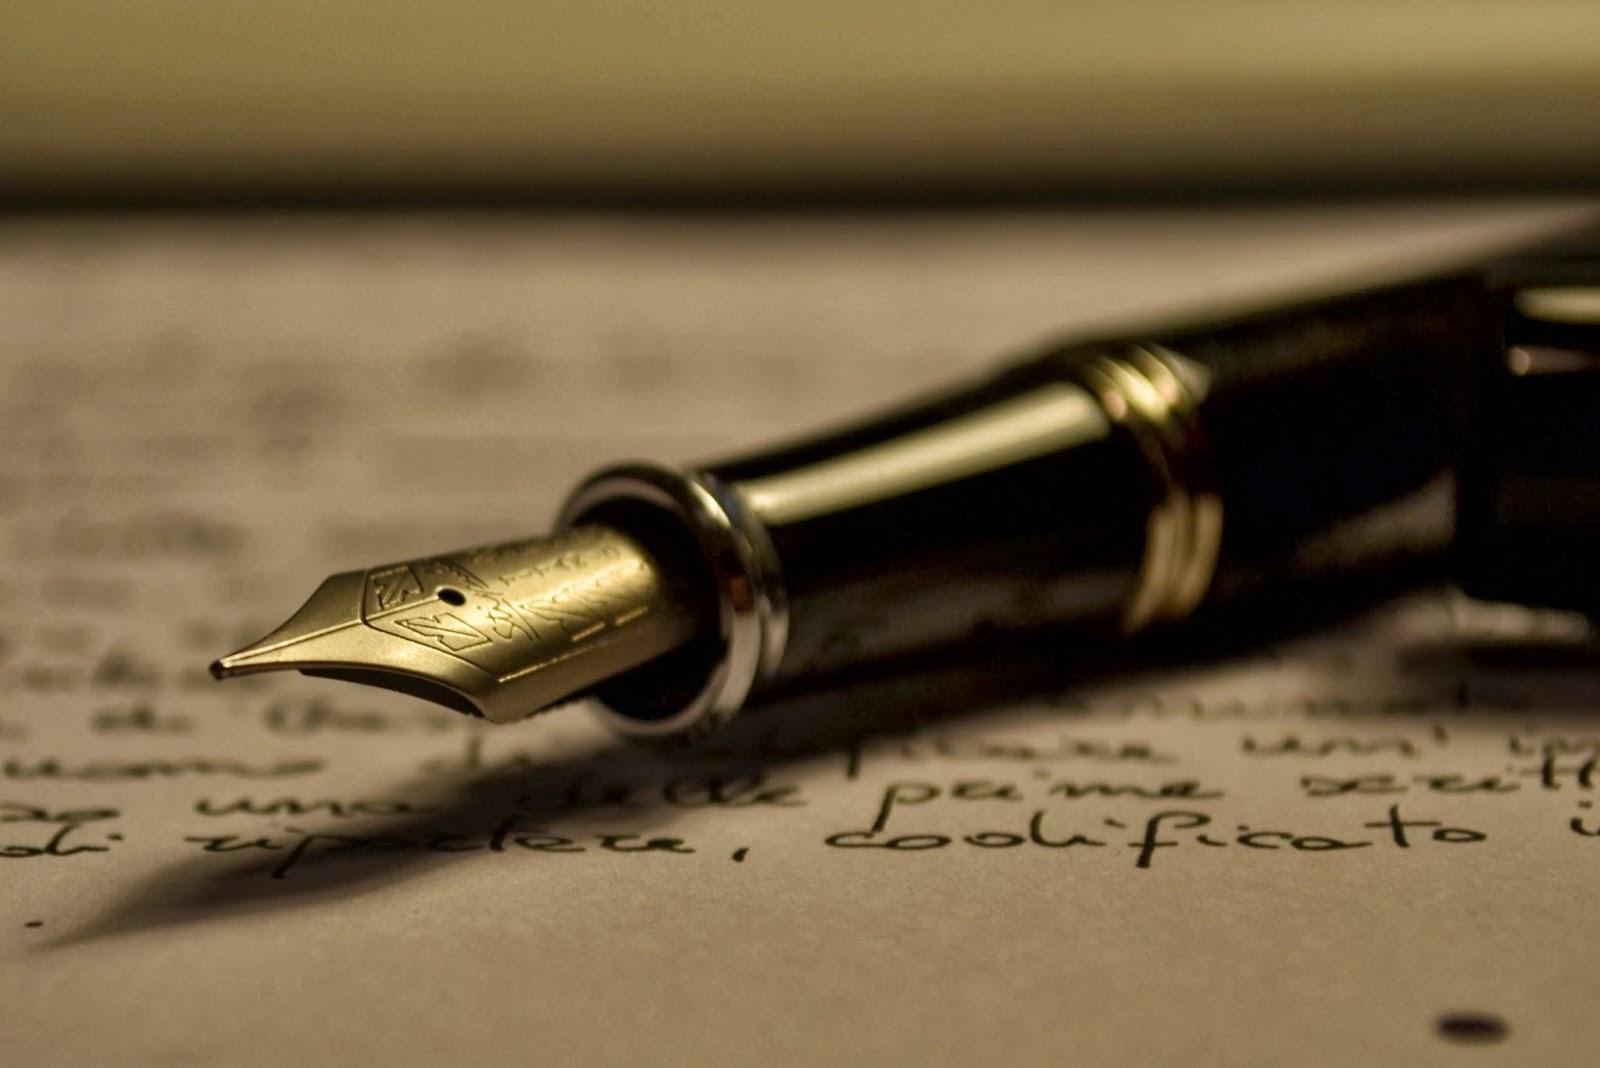 custom essay writing online usa how to provide that by maria david essay writing jpg 1600times1068